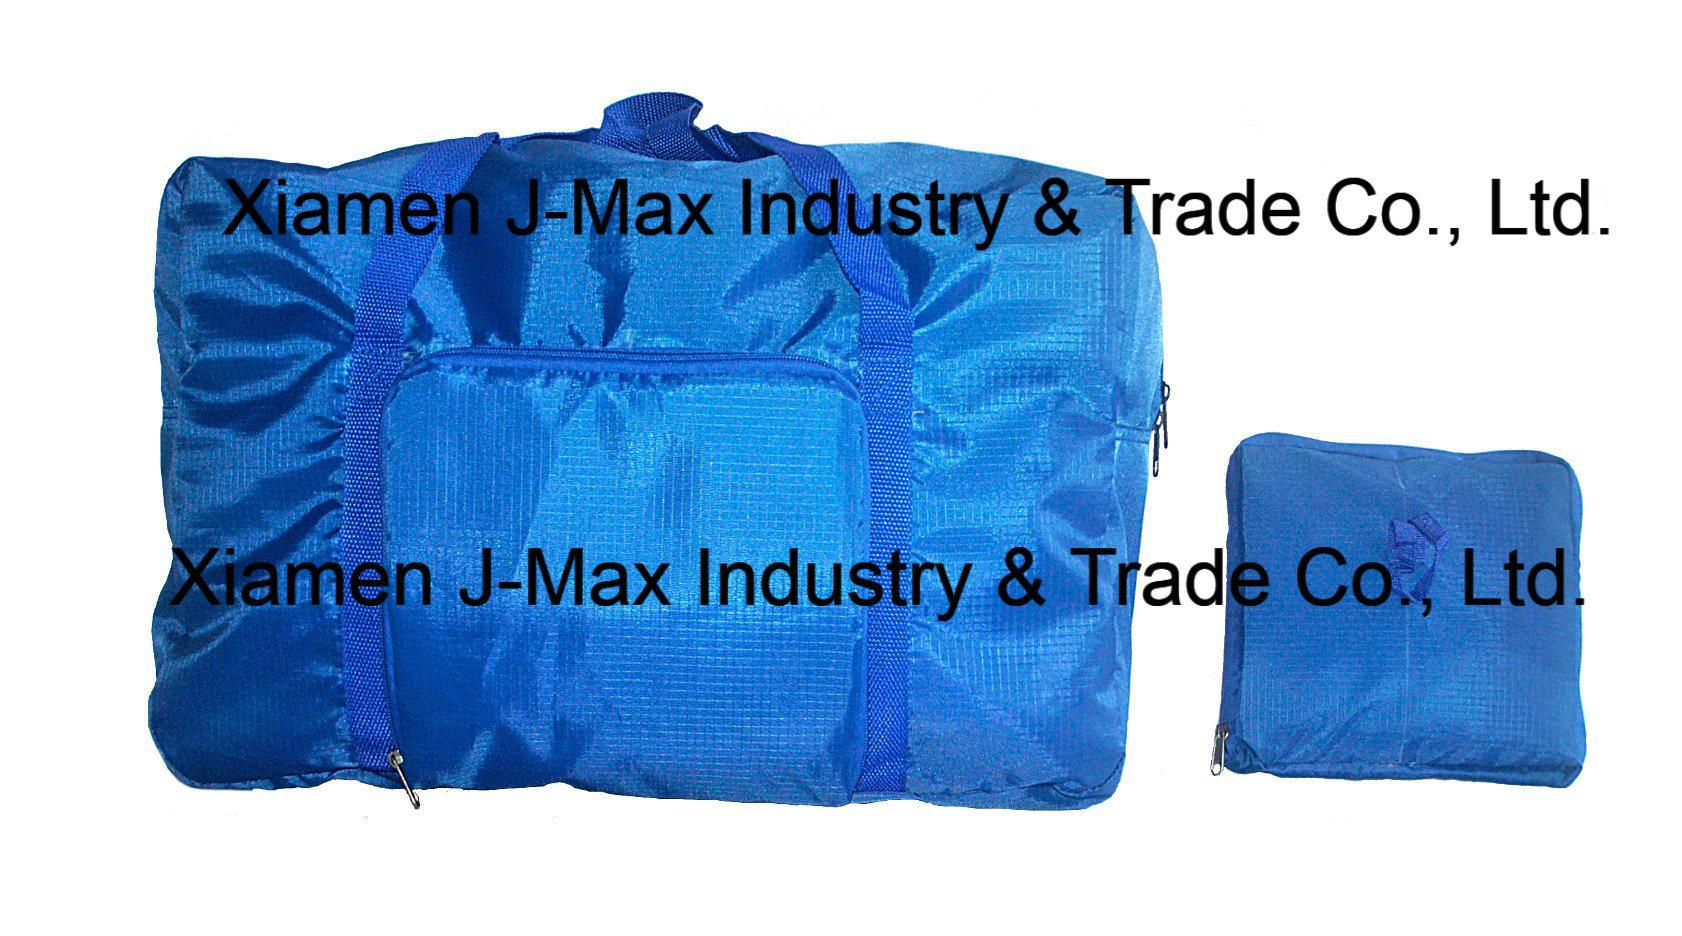 Foldable Duffel Bag for Travel Sports, Portablelightweigh Dustproofdurable, Multiplecolors, Menwomen